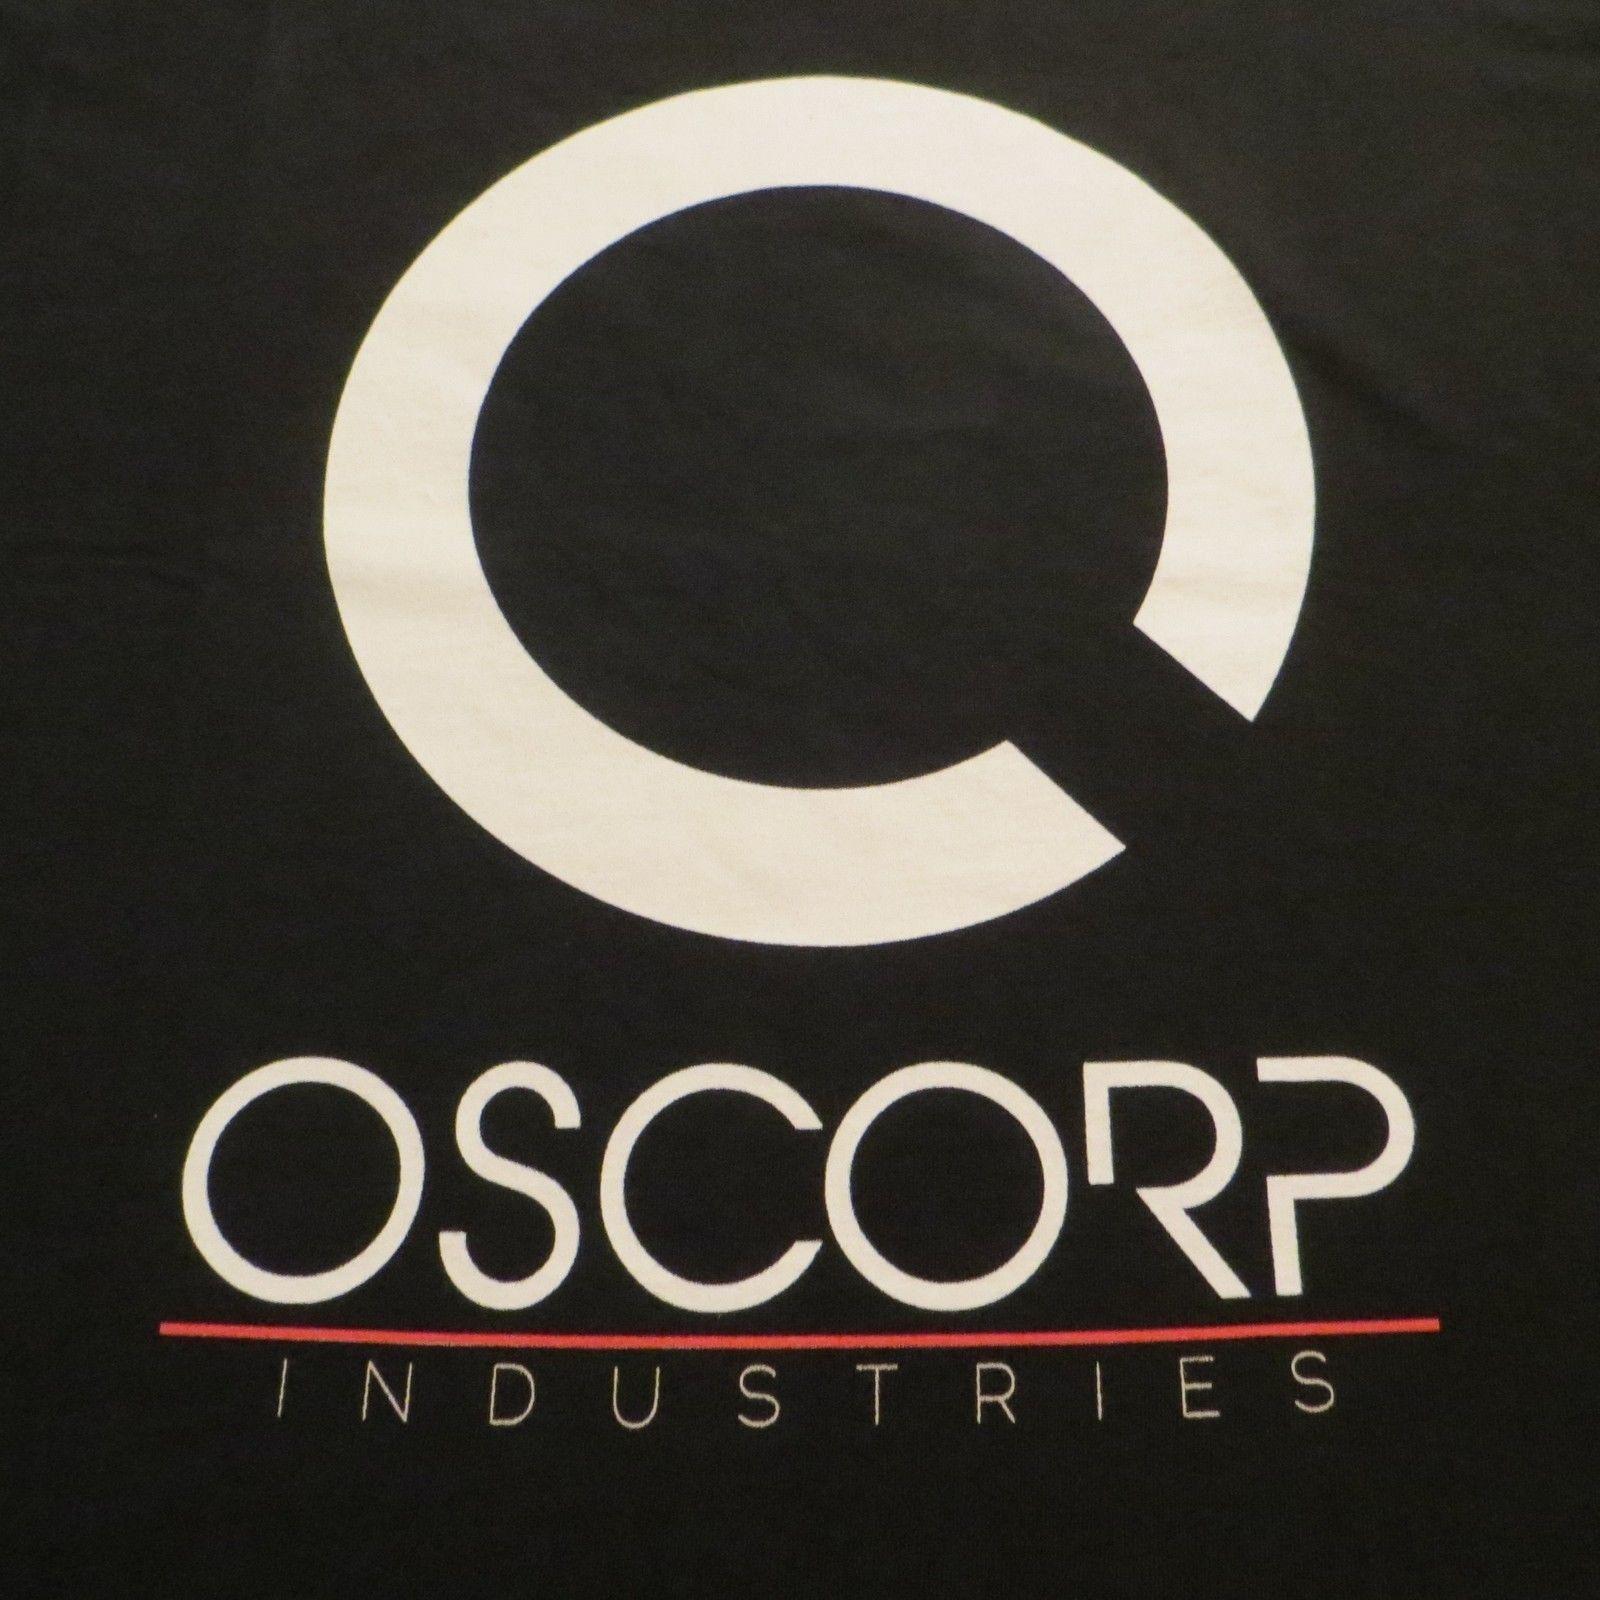 Oscorp industries xl t-shirt - new - marvel amazing spider